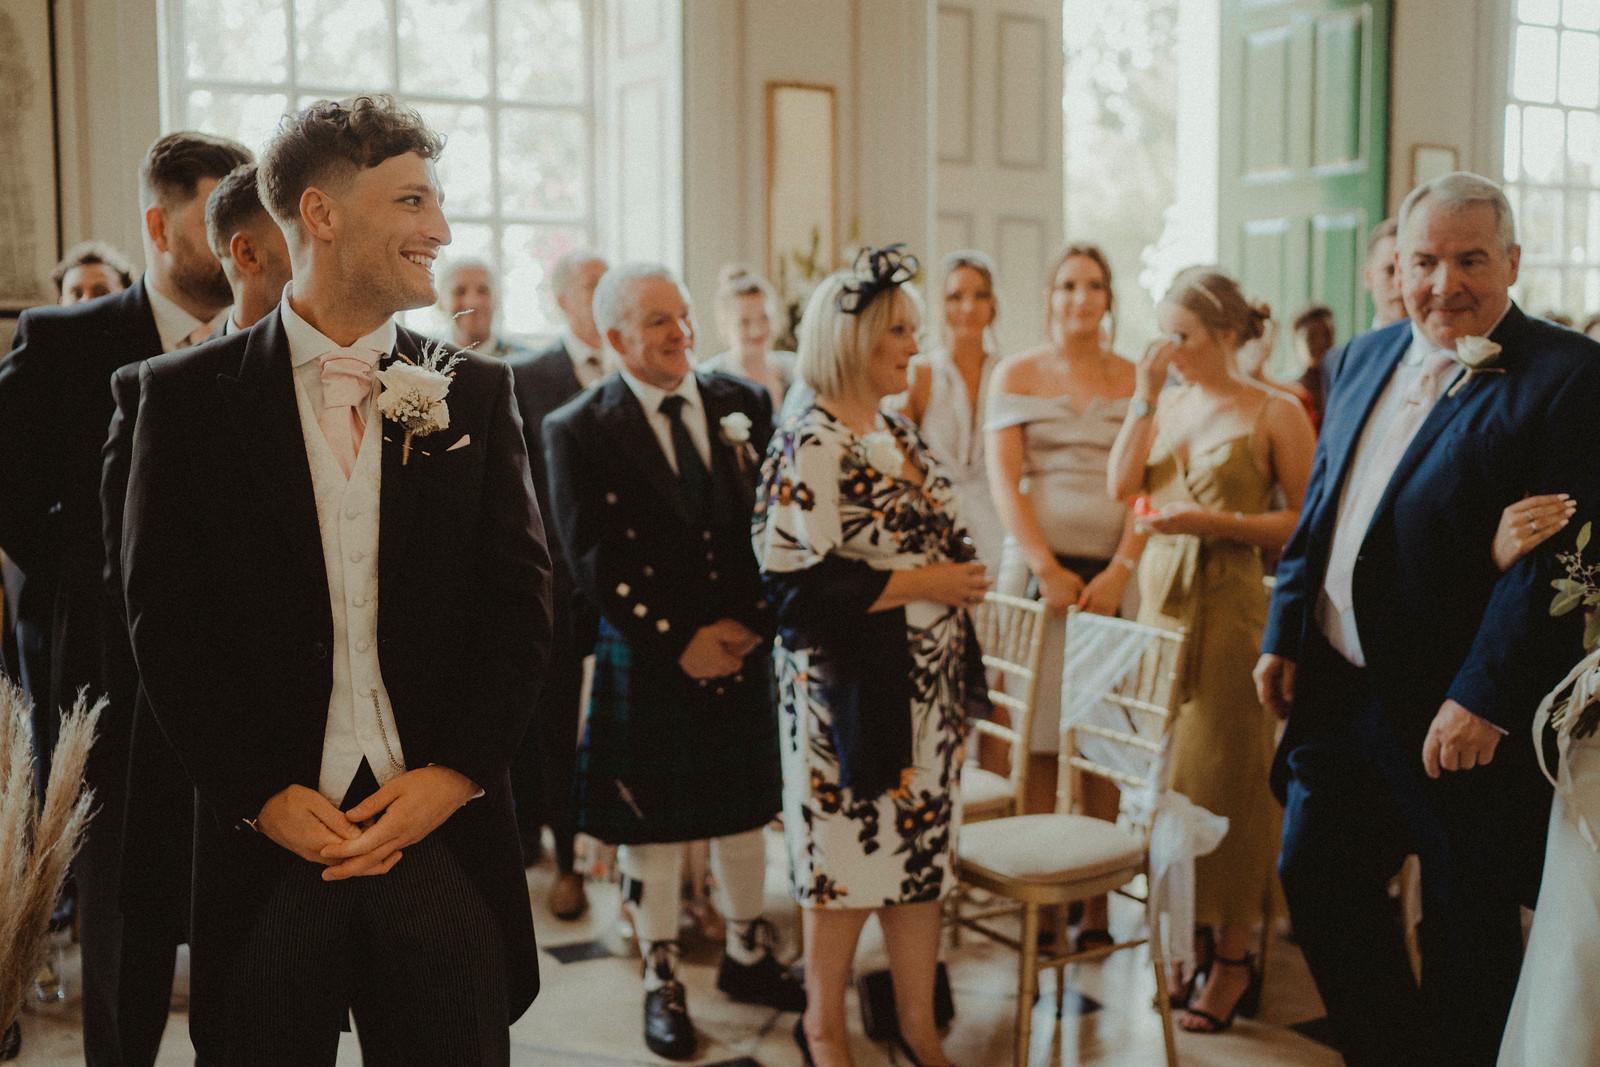 Groom smiles as his bride walks down the aisle